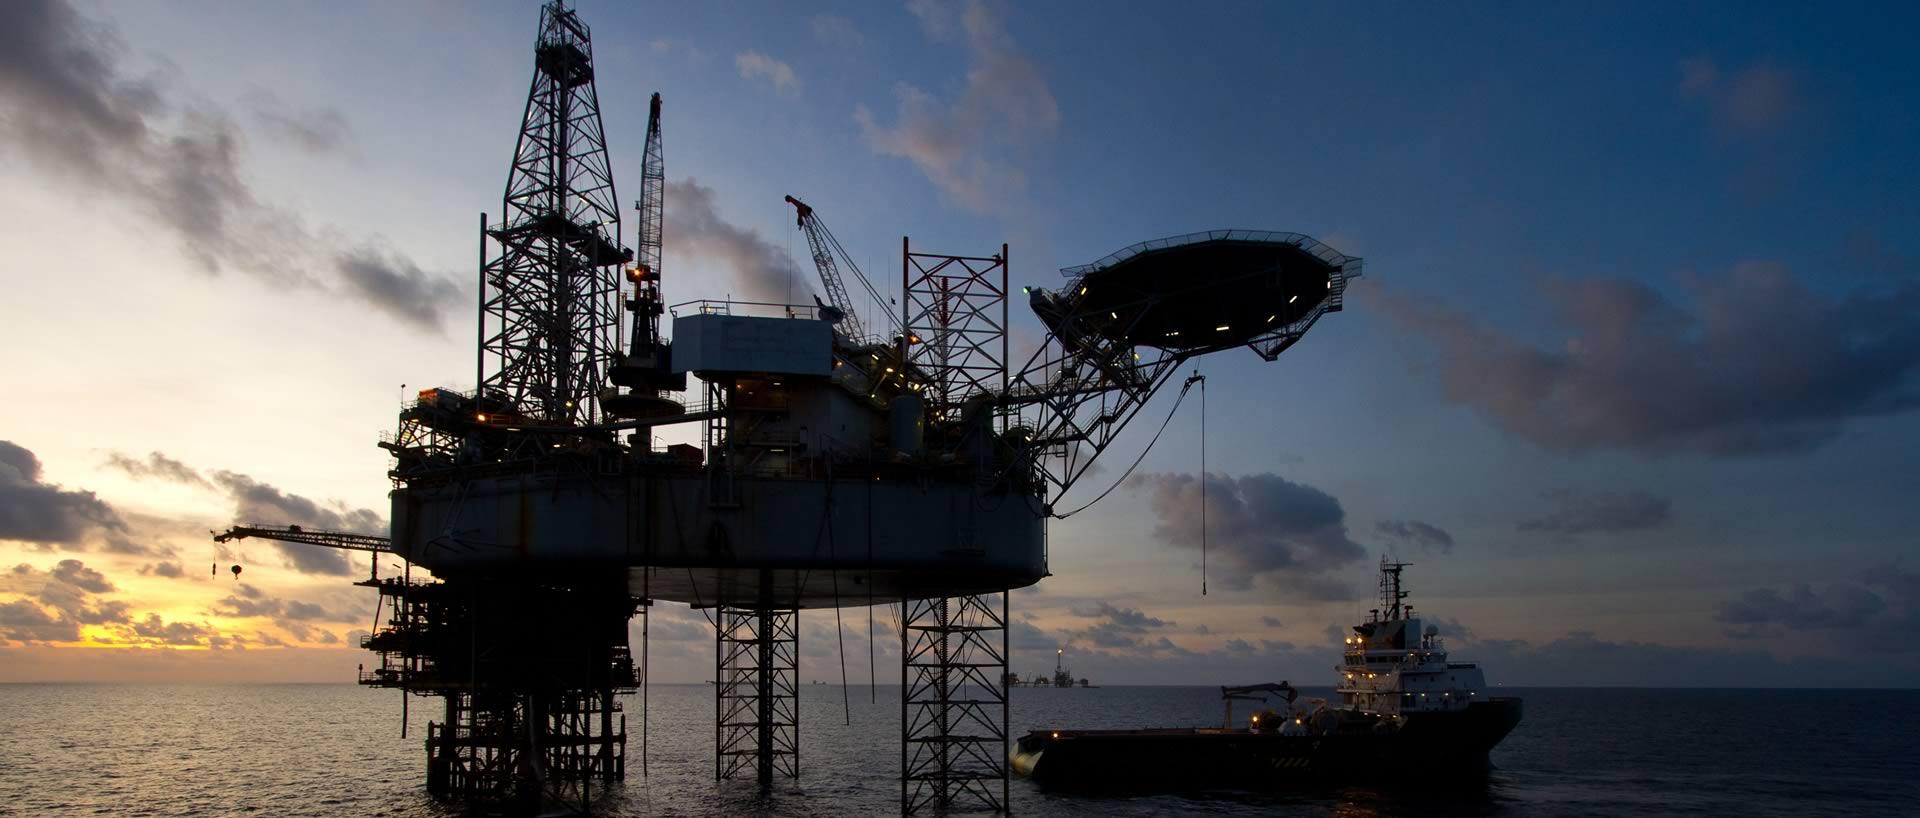 slider-oil-rig